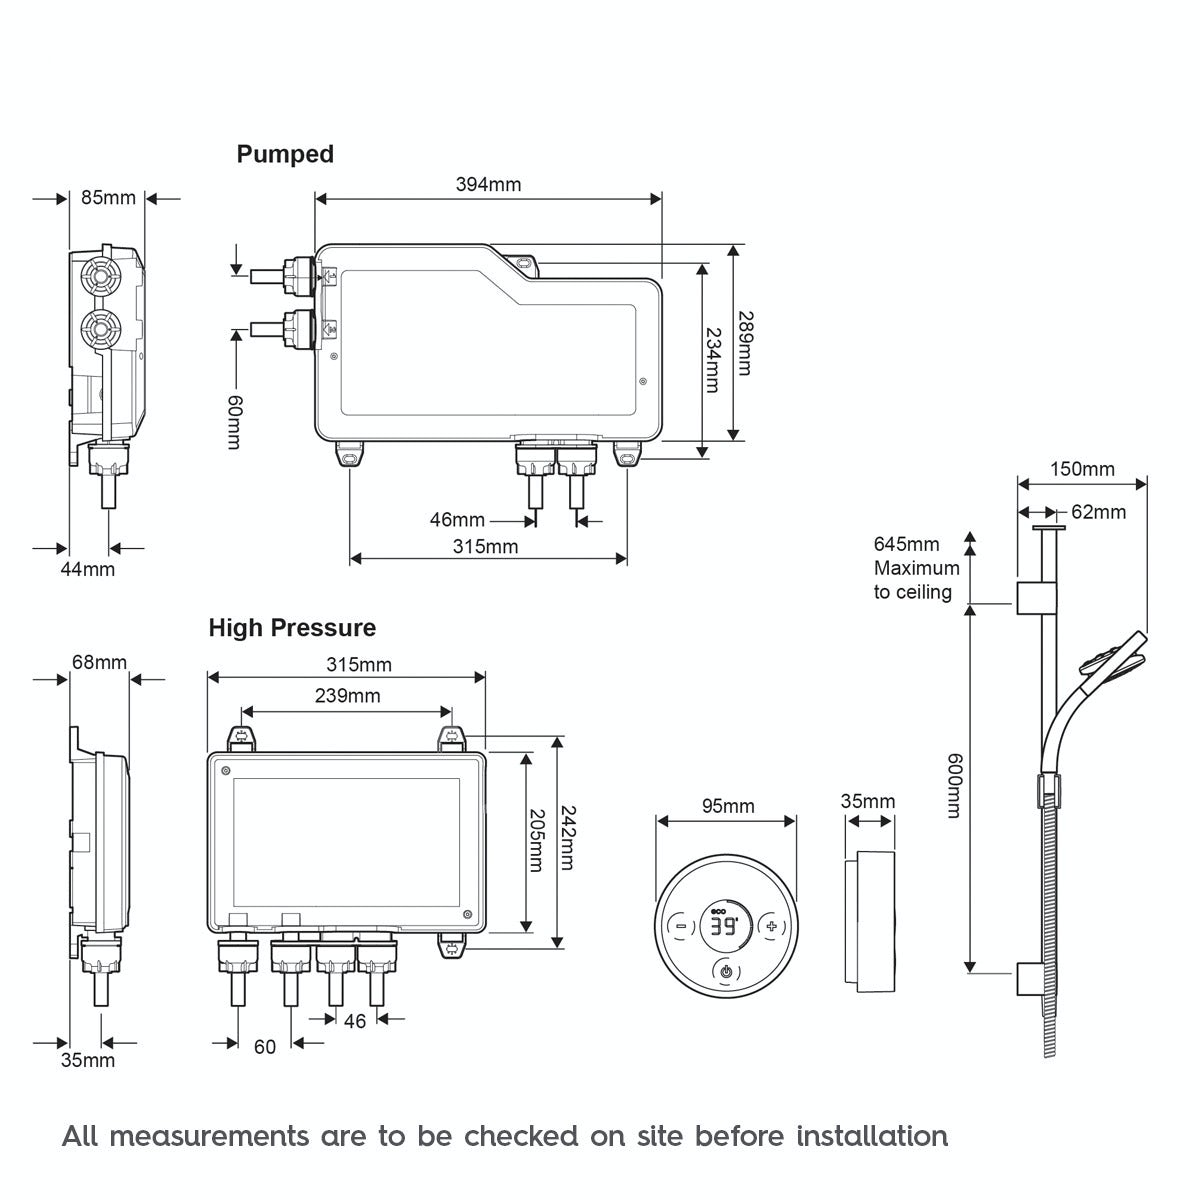 Dimensions for Mira Platinum ceiling fed digital shower standard